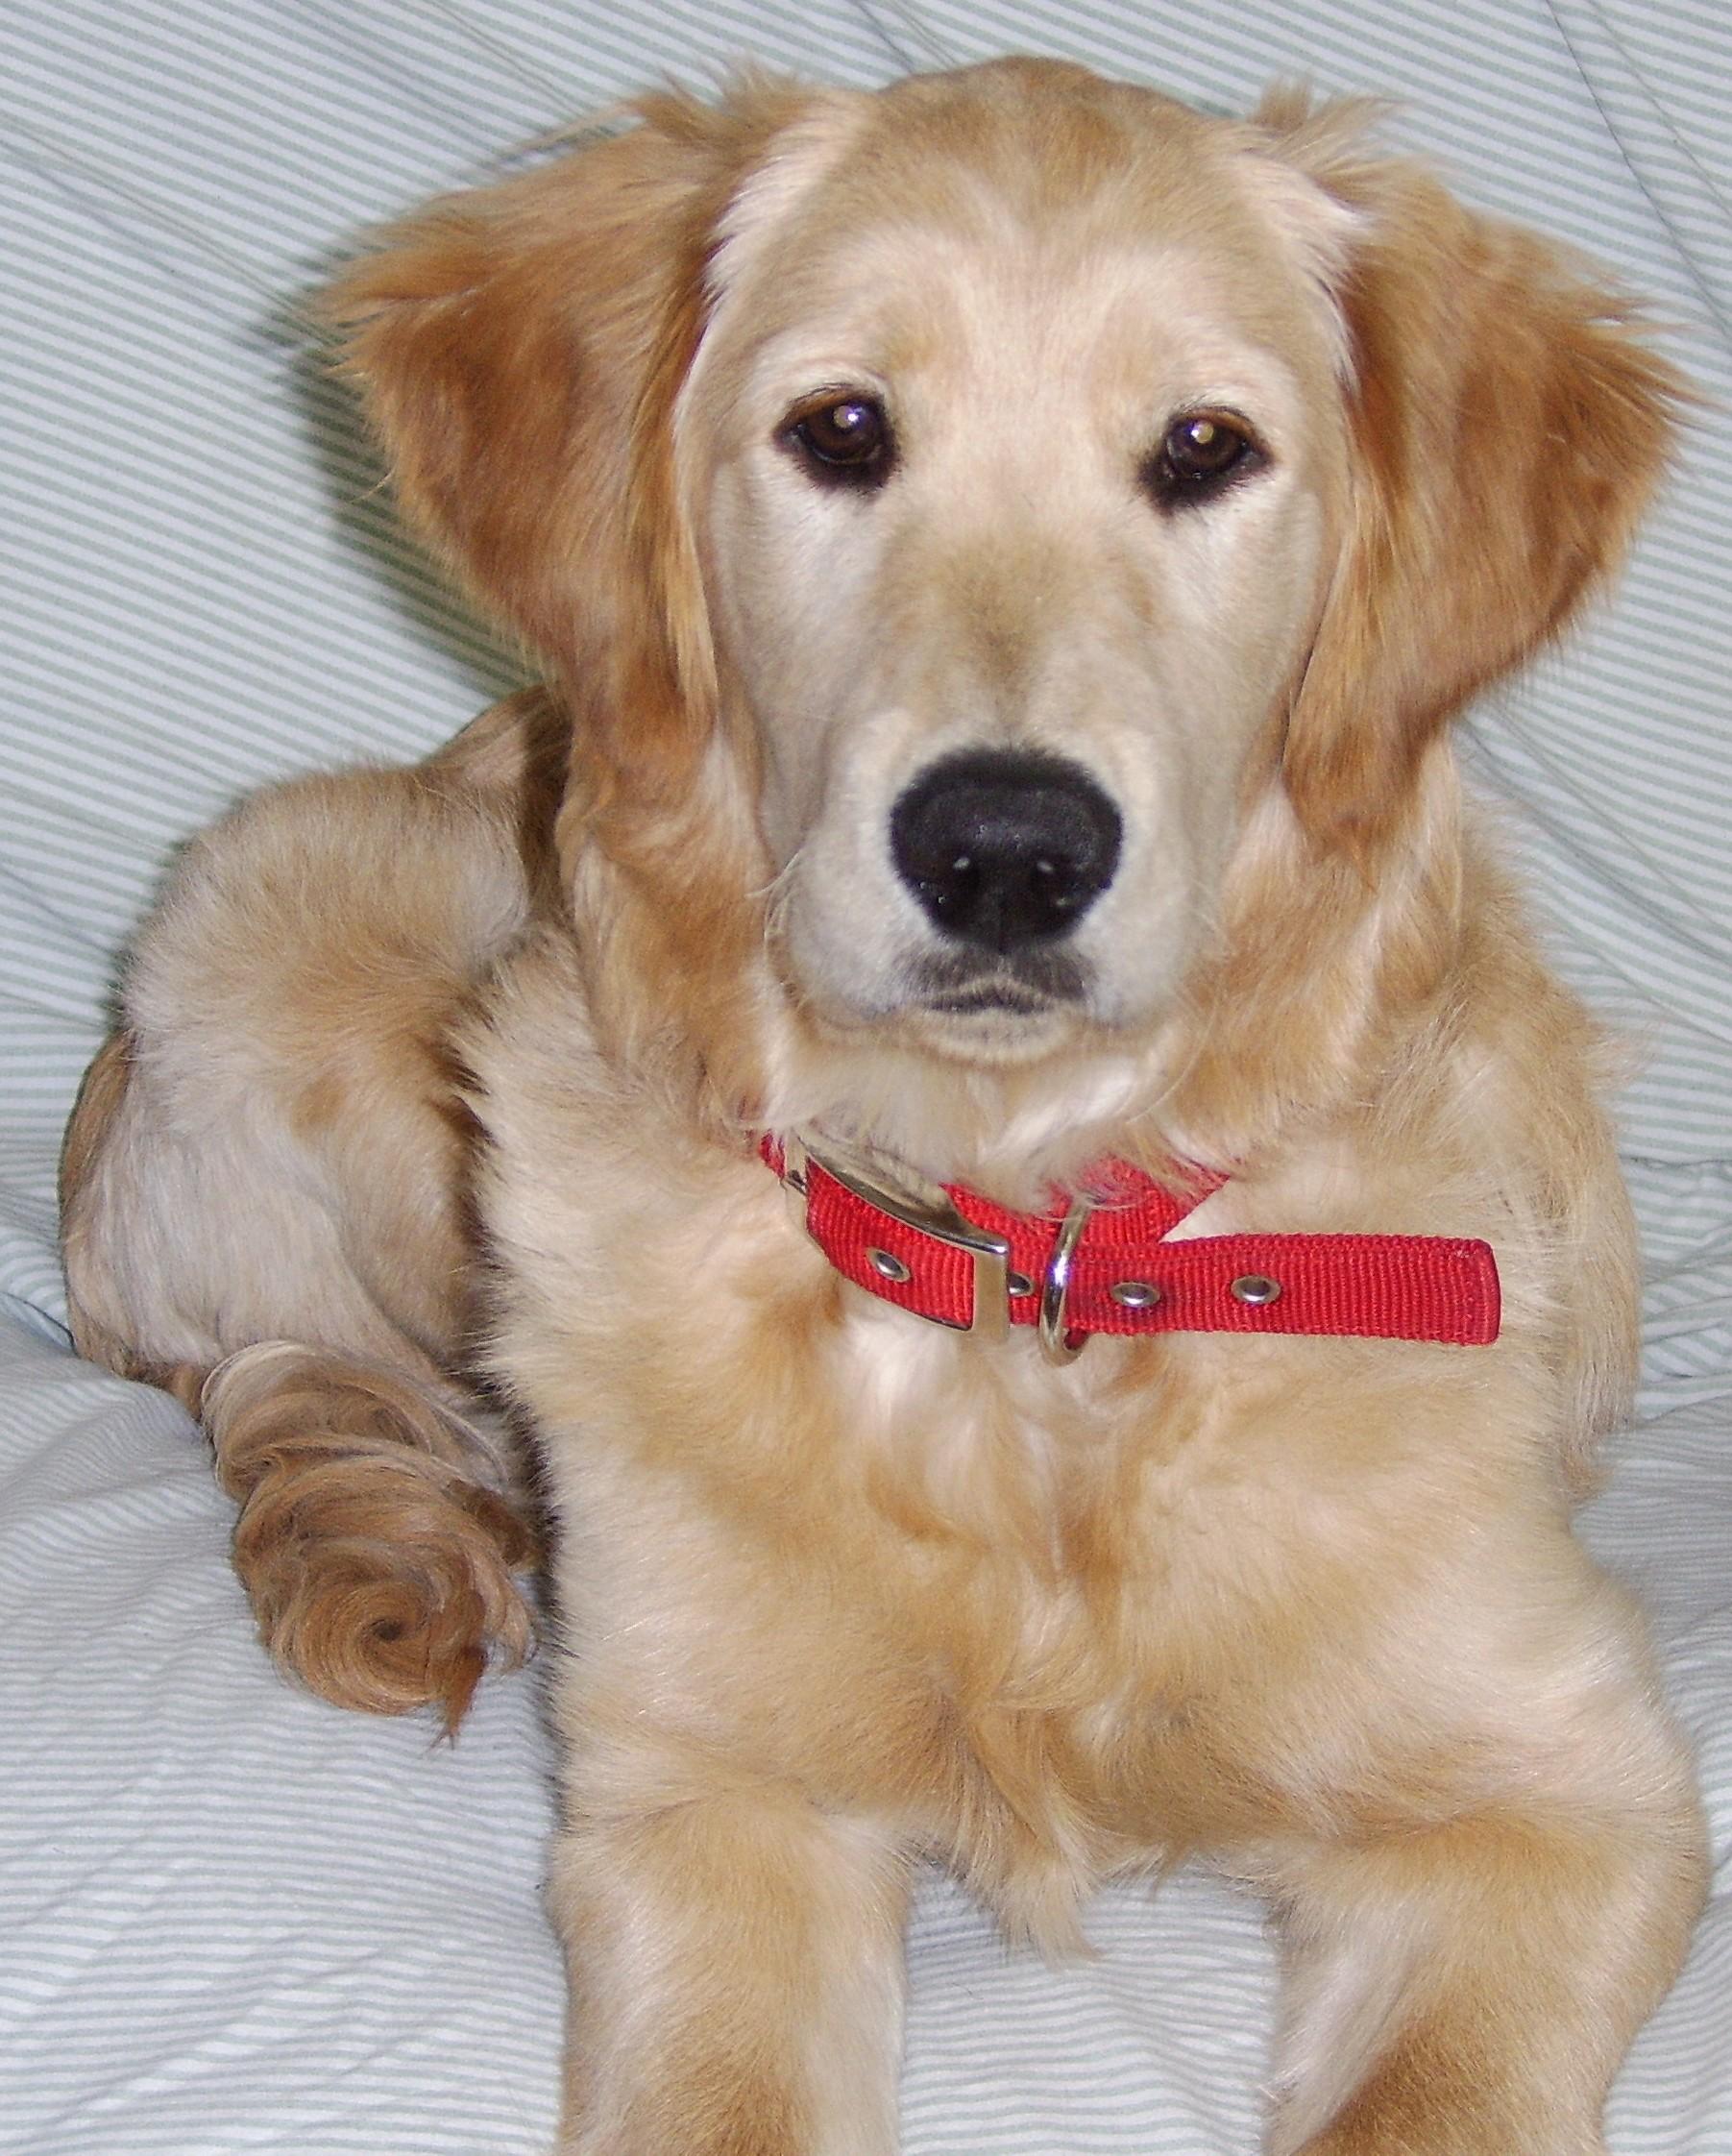 Puppy Love - Joy's Pics of Pup